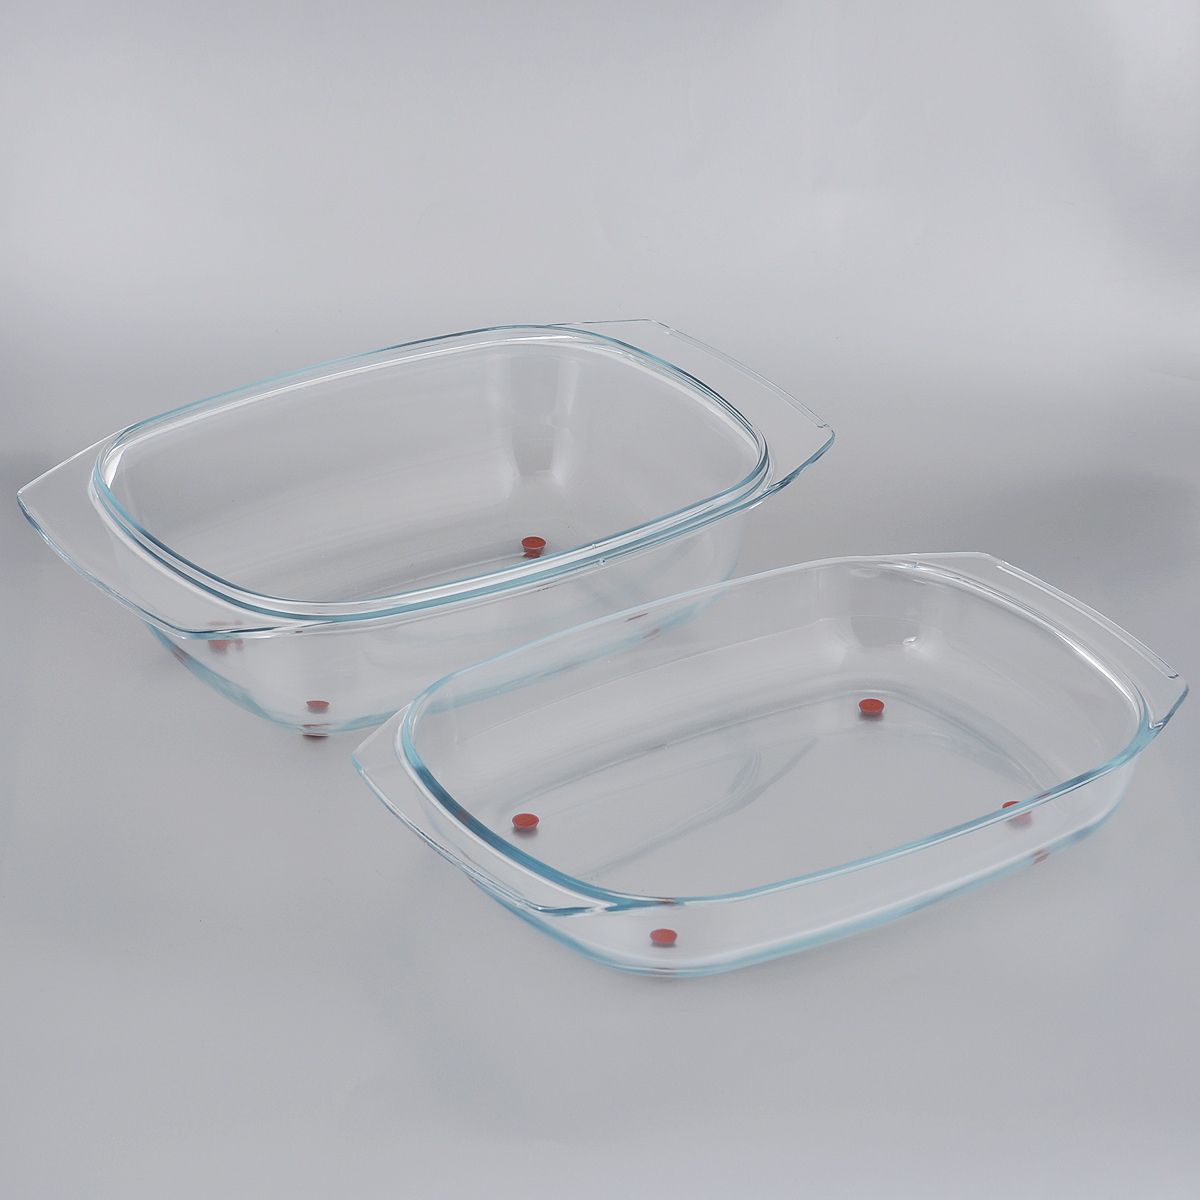 Жаровня Tescoma Delicia Glass с крышкой, 42 см х 26 см